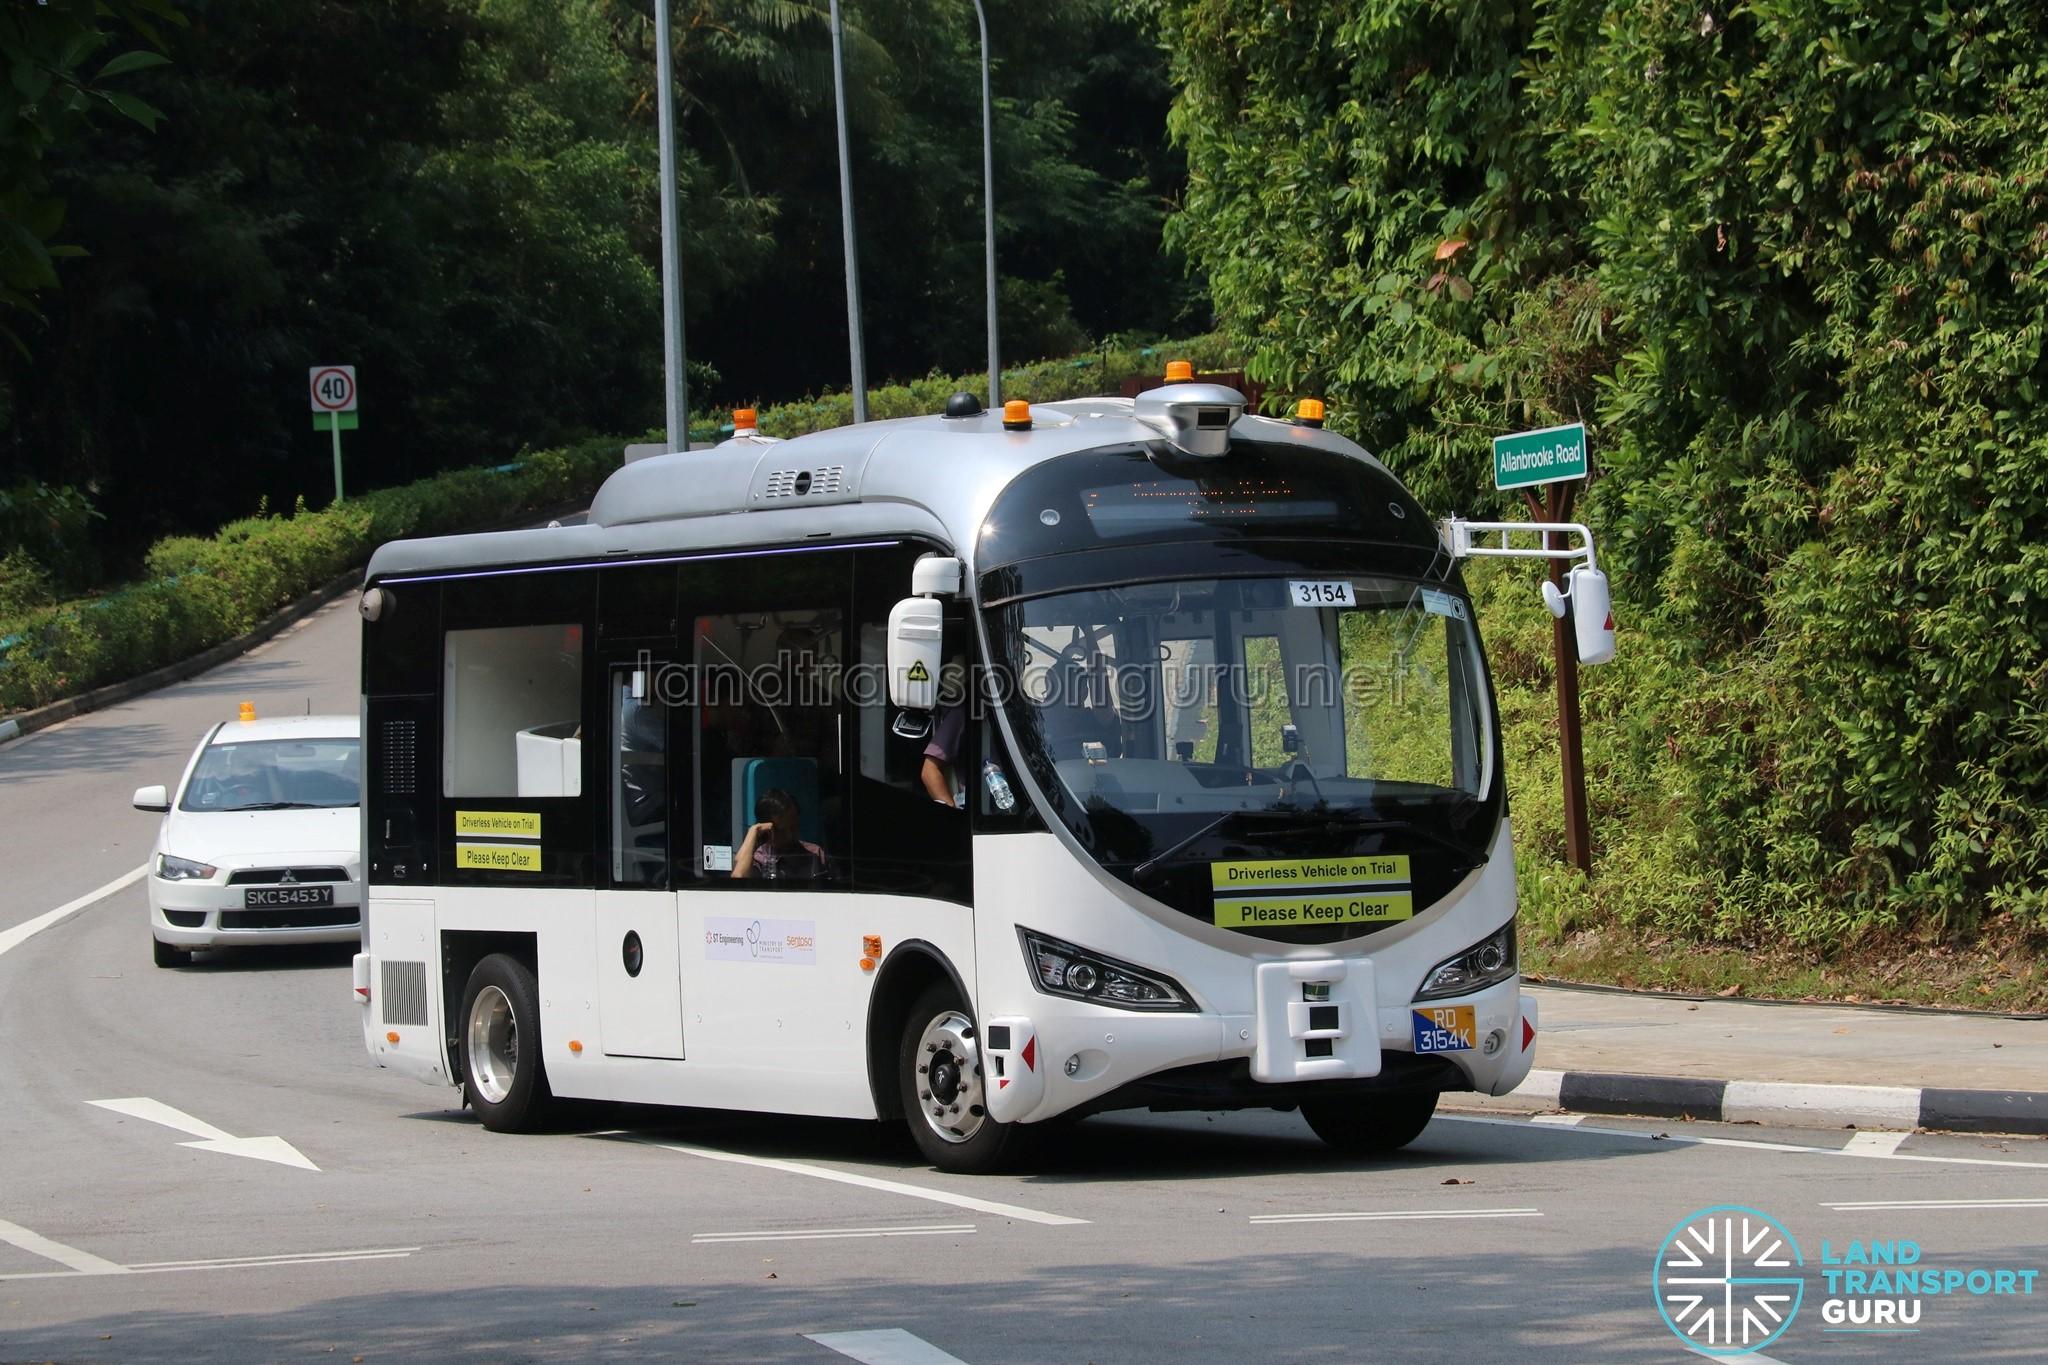 ST Autobus - Sentosa Trial (near Palawan Beach)